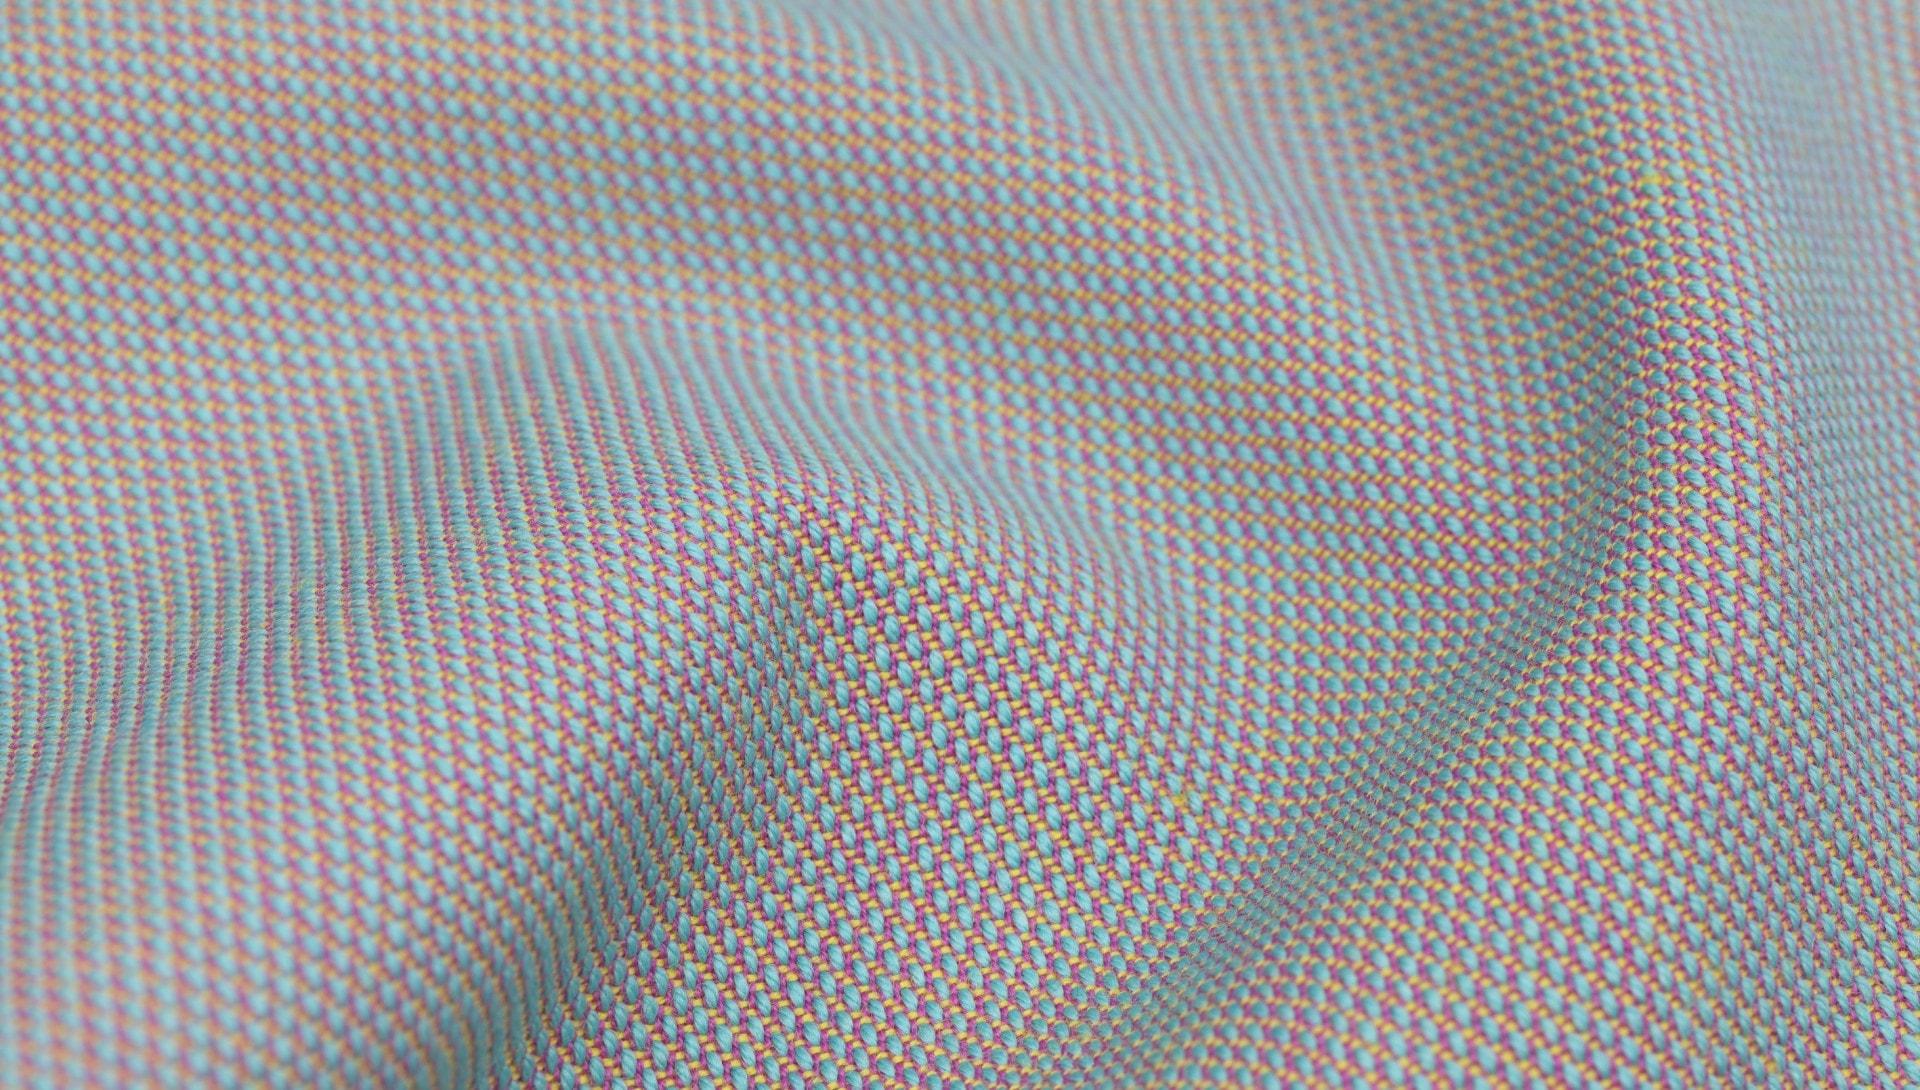 kvadrat tekstiler